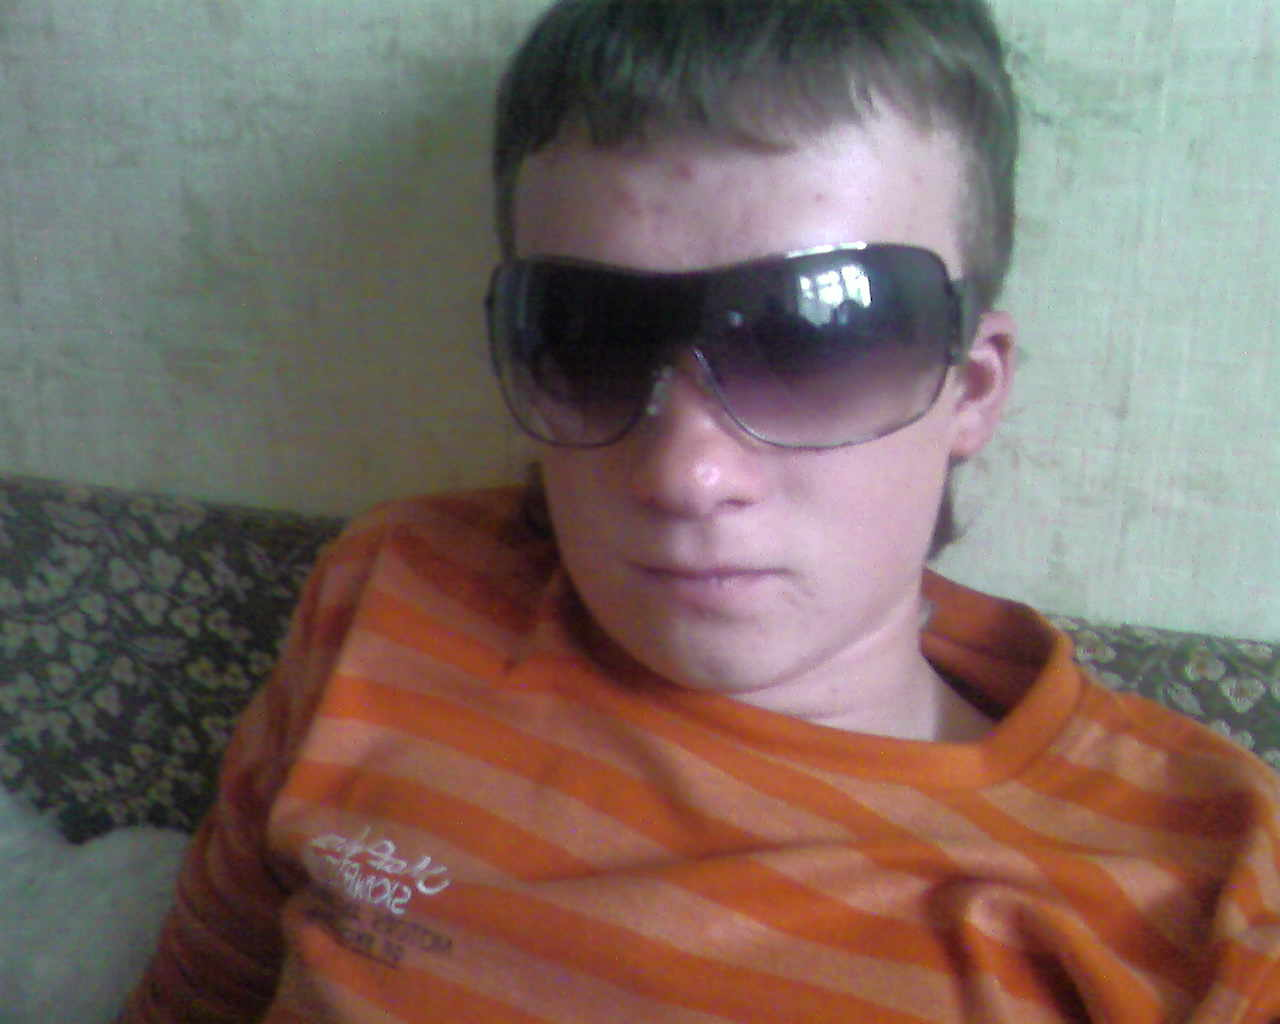 http://rock.ru/photo/img/51b0c0177d9acf85d852157a3c0ed454.jpeg